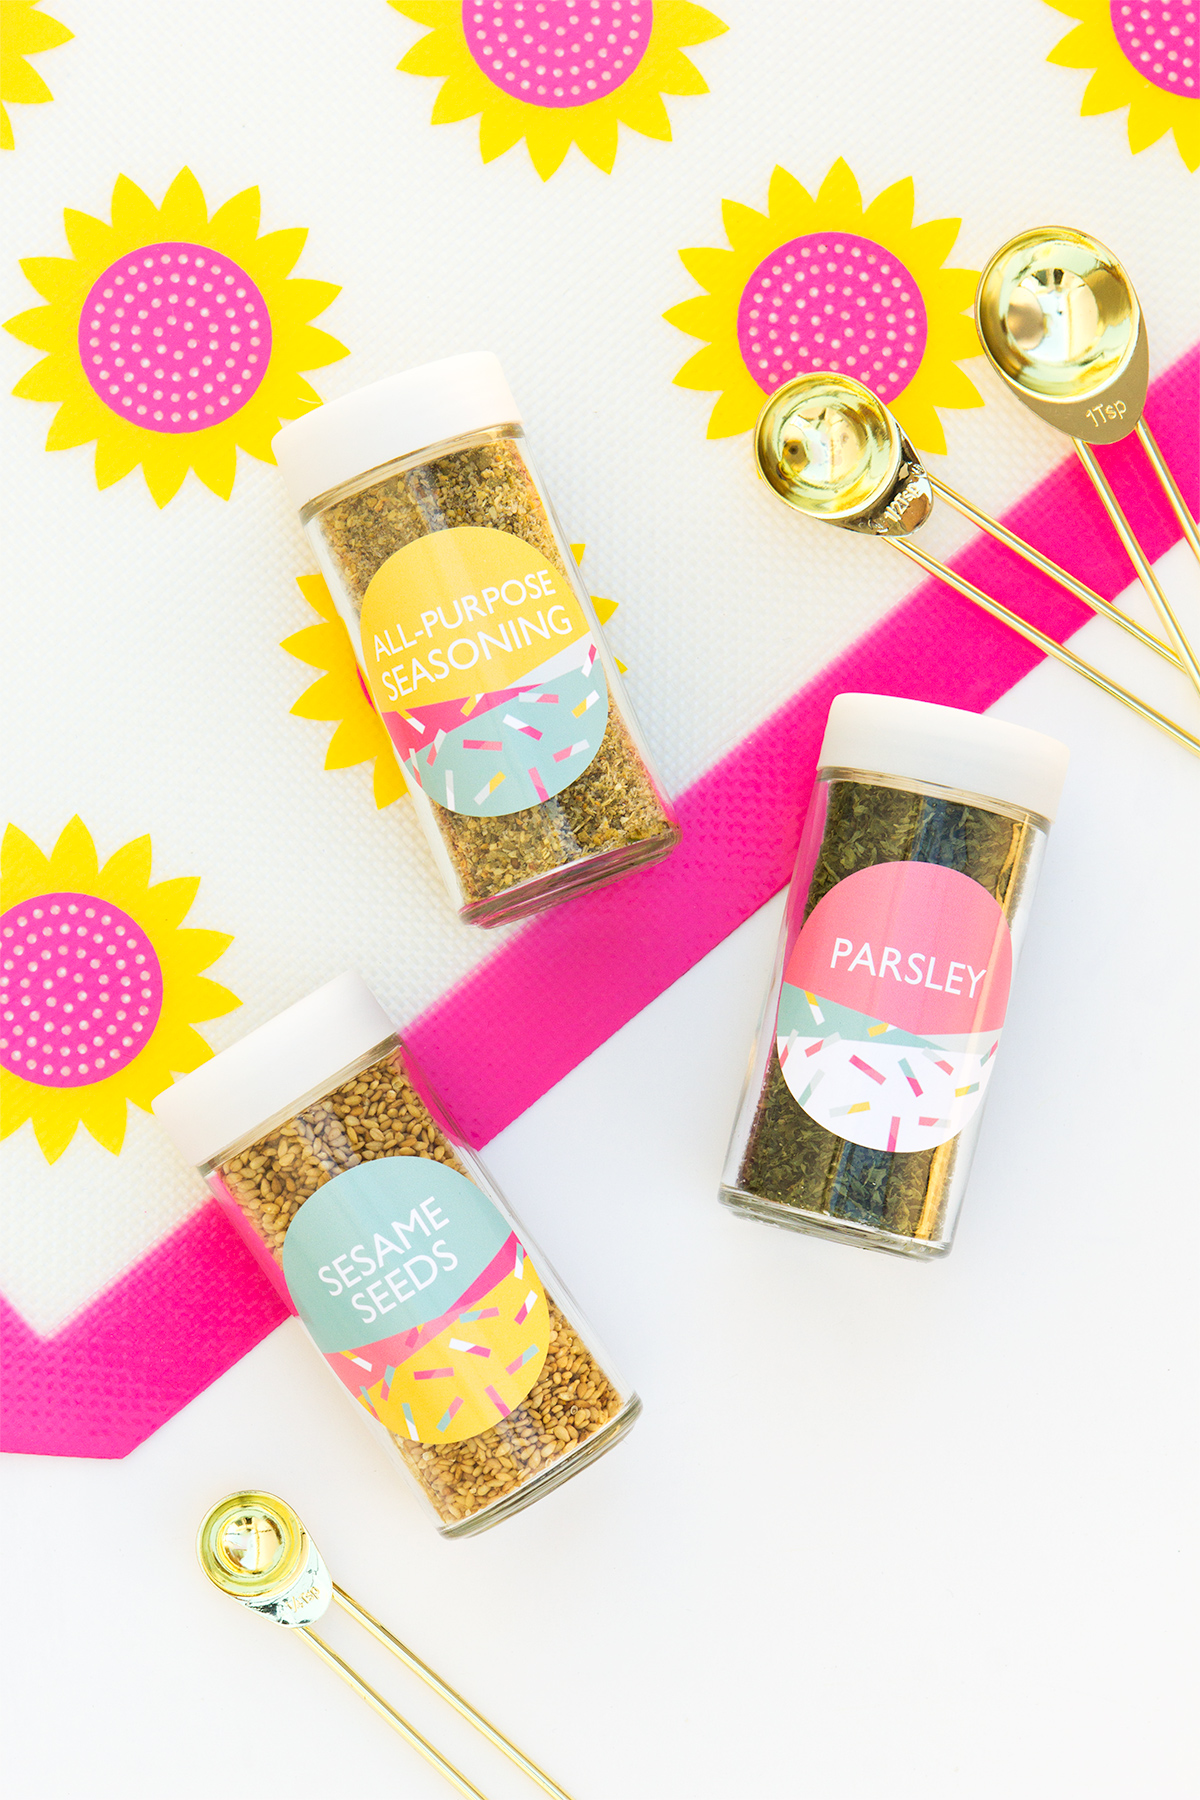 photograph about Printable Spice Jar Labels named Printable Spice Jar Labels - Sarah Hearts